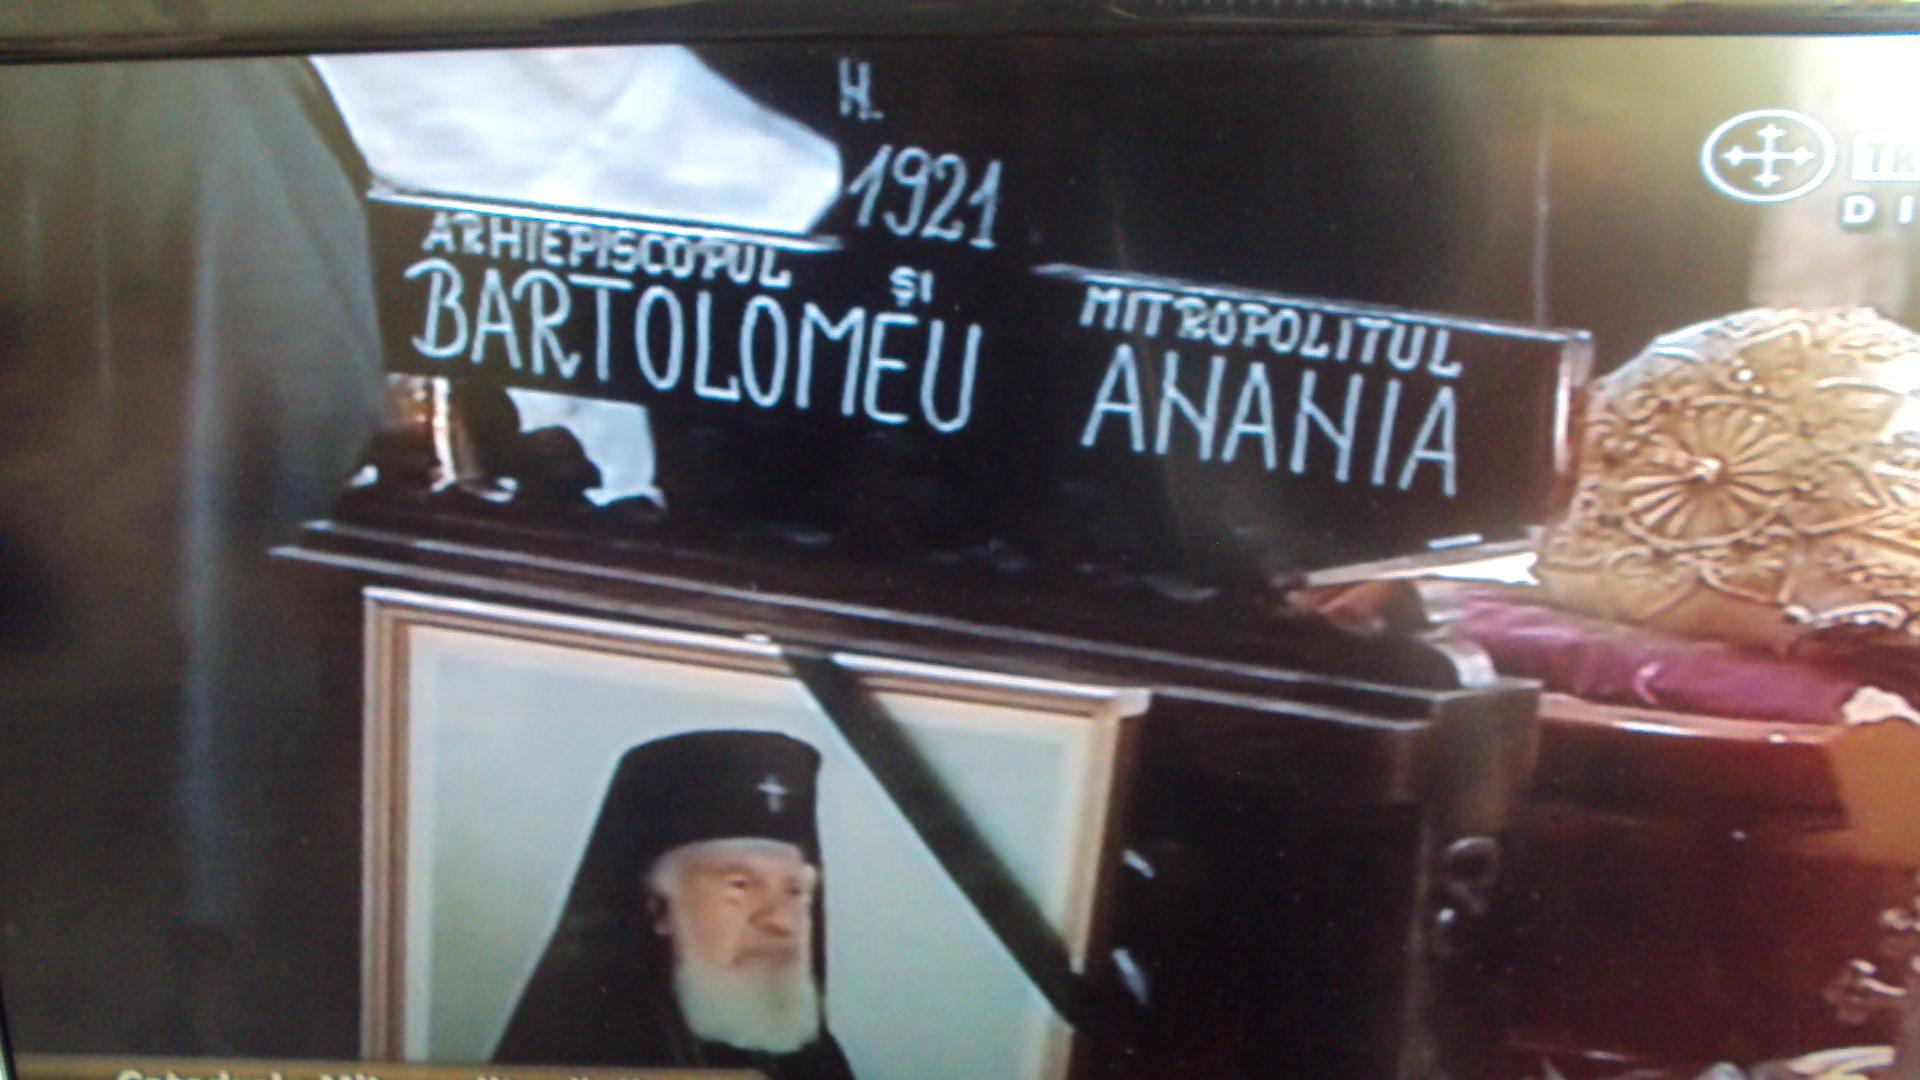 http://ia600400.us.archive.org/10/items/InmormantareaIpsAcad.Dr.BartolomeuAnania3Februarie2011/DSC00321.JPG